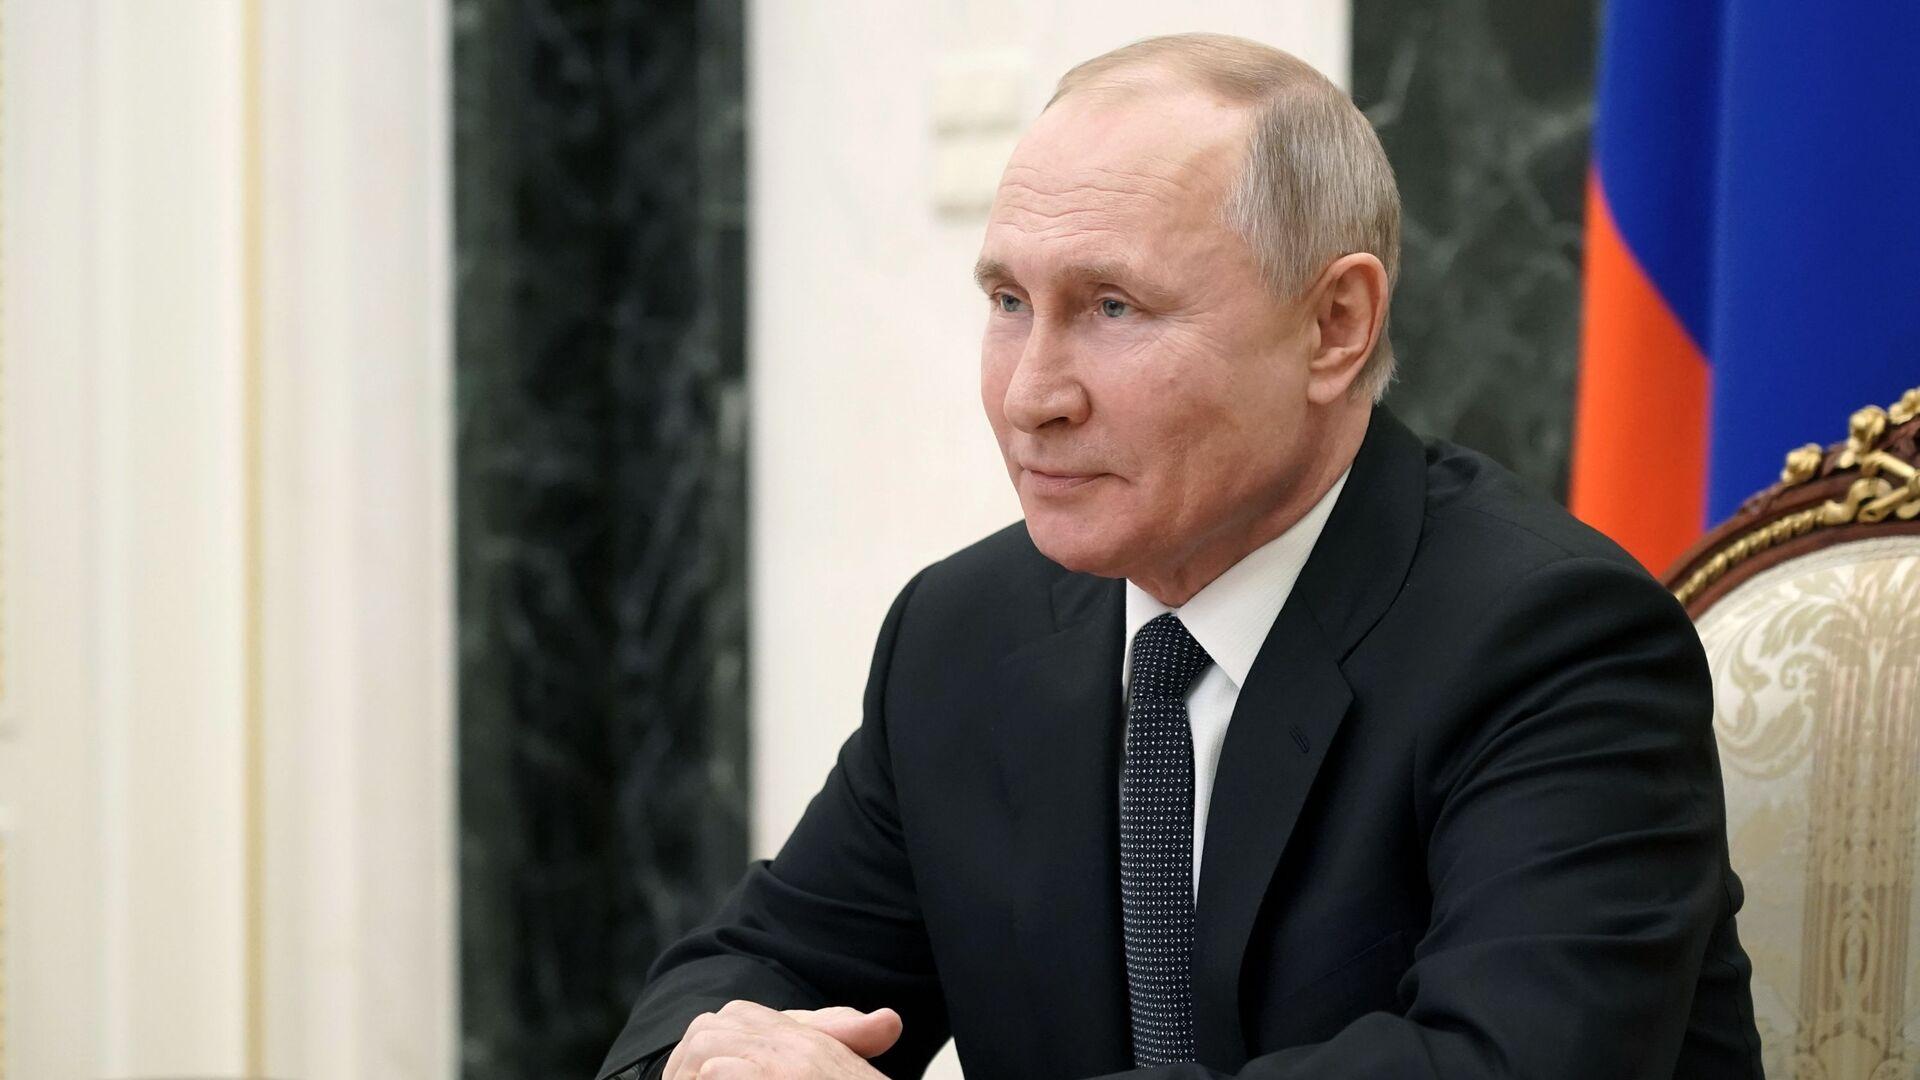 Президент РФ Владимир Путин - Sputnik Беларусь, 1920, 16.03.2021